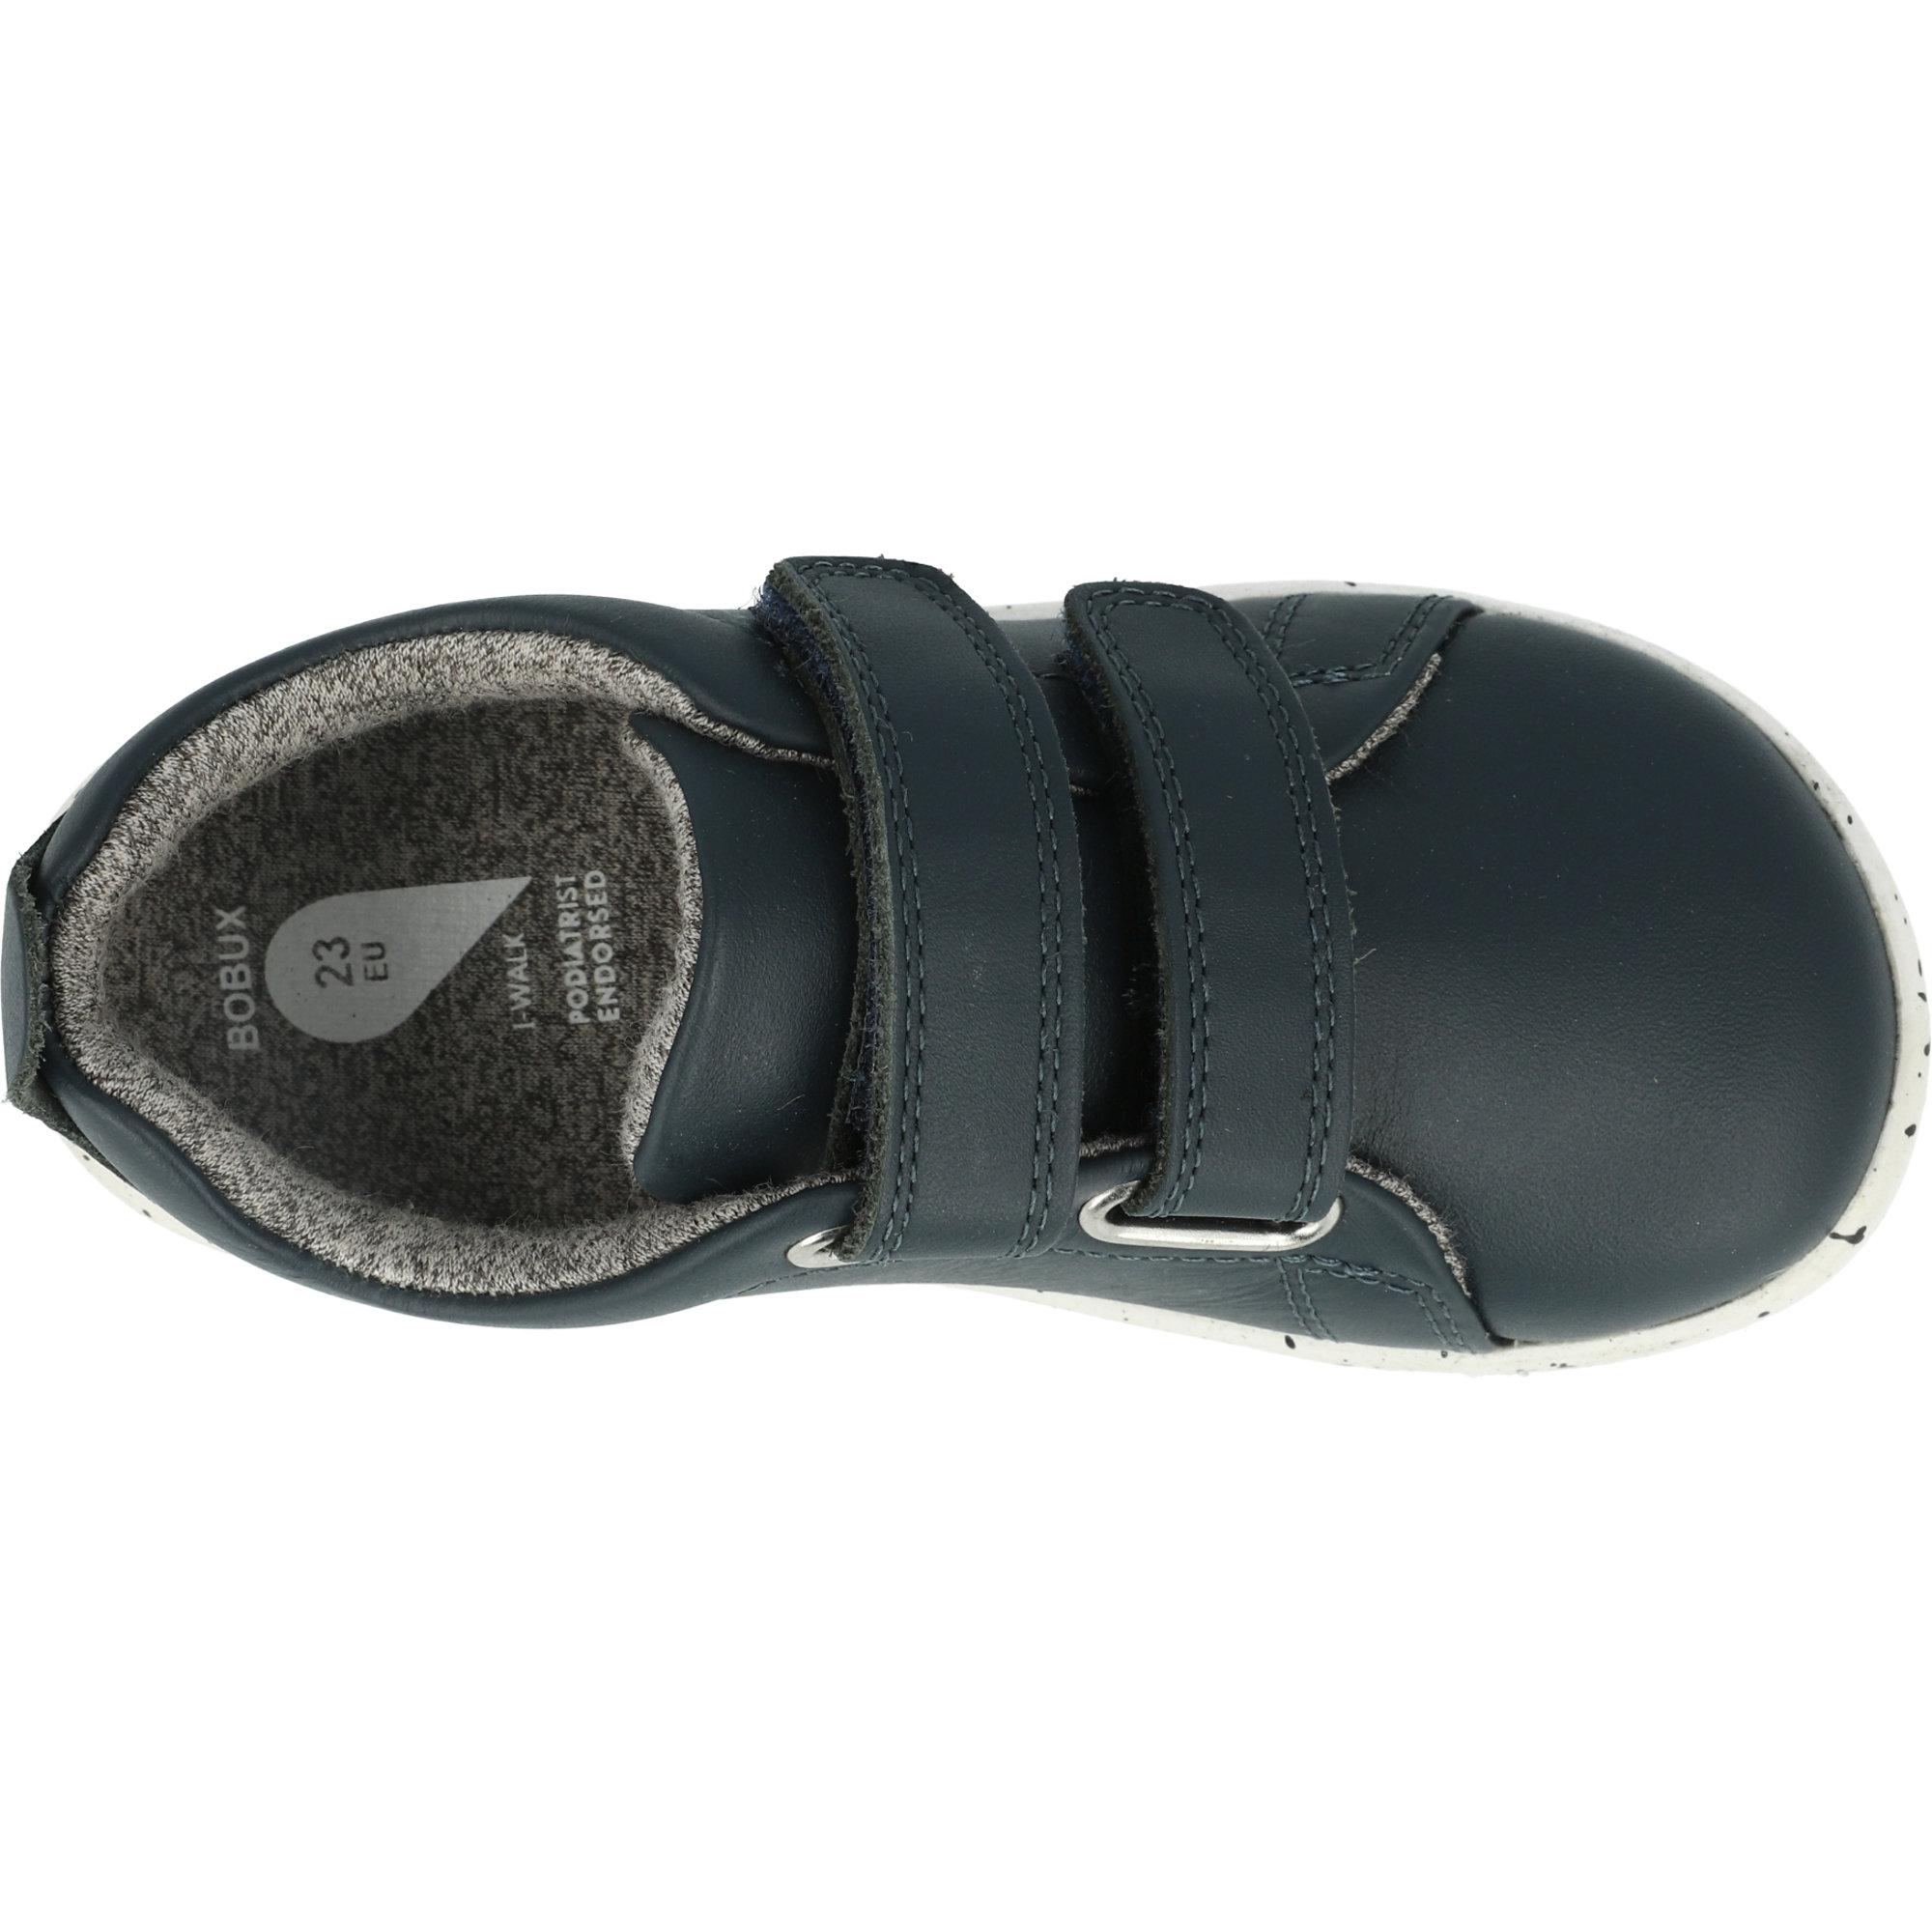 Bobux i-Walk Grass Court Navy Leather Infant